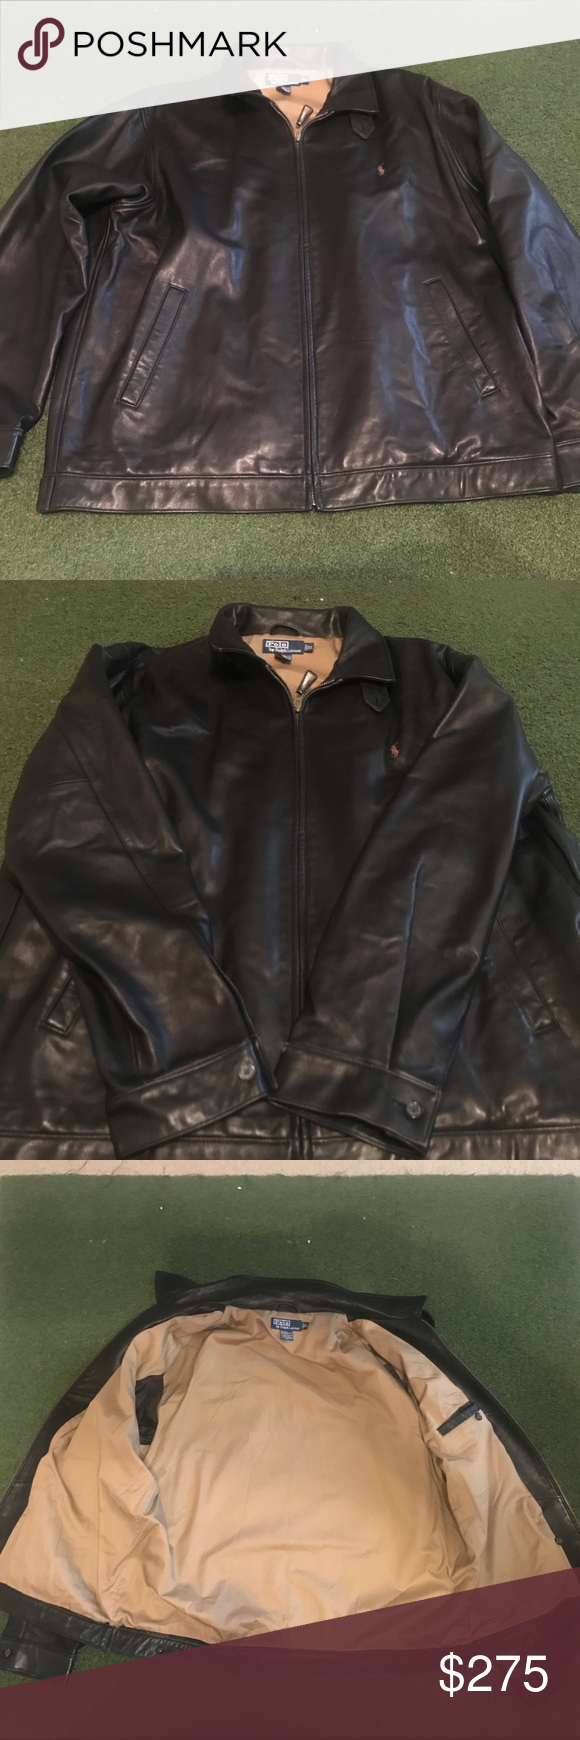 Polo Ralph Lauren Men S Xl Lambskin Leather Jacket Lambskin Leather Jacket Polo Ralph Lauren Mens Leather Jacket [ 1740 x 580 Pixel ]